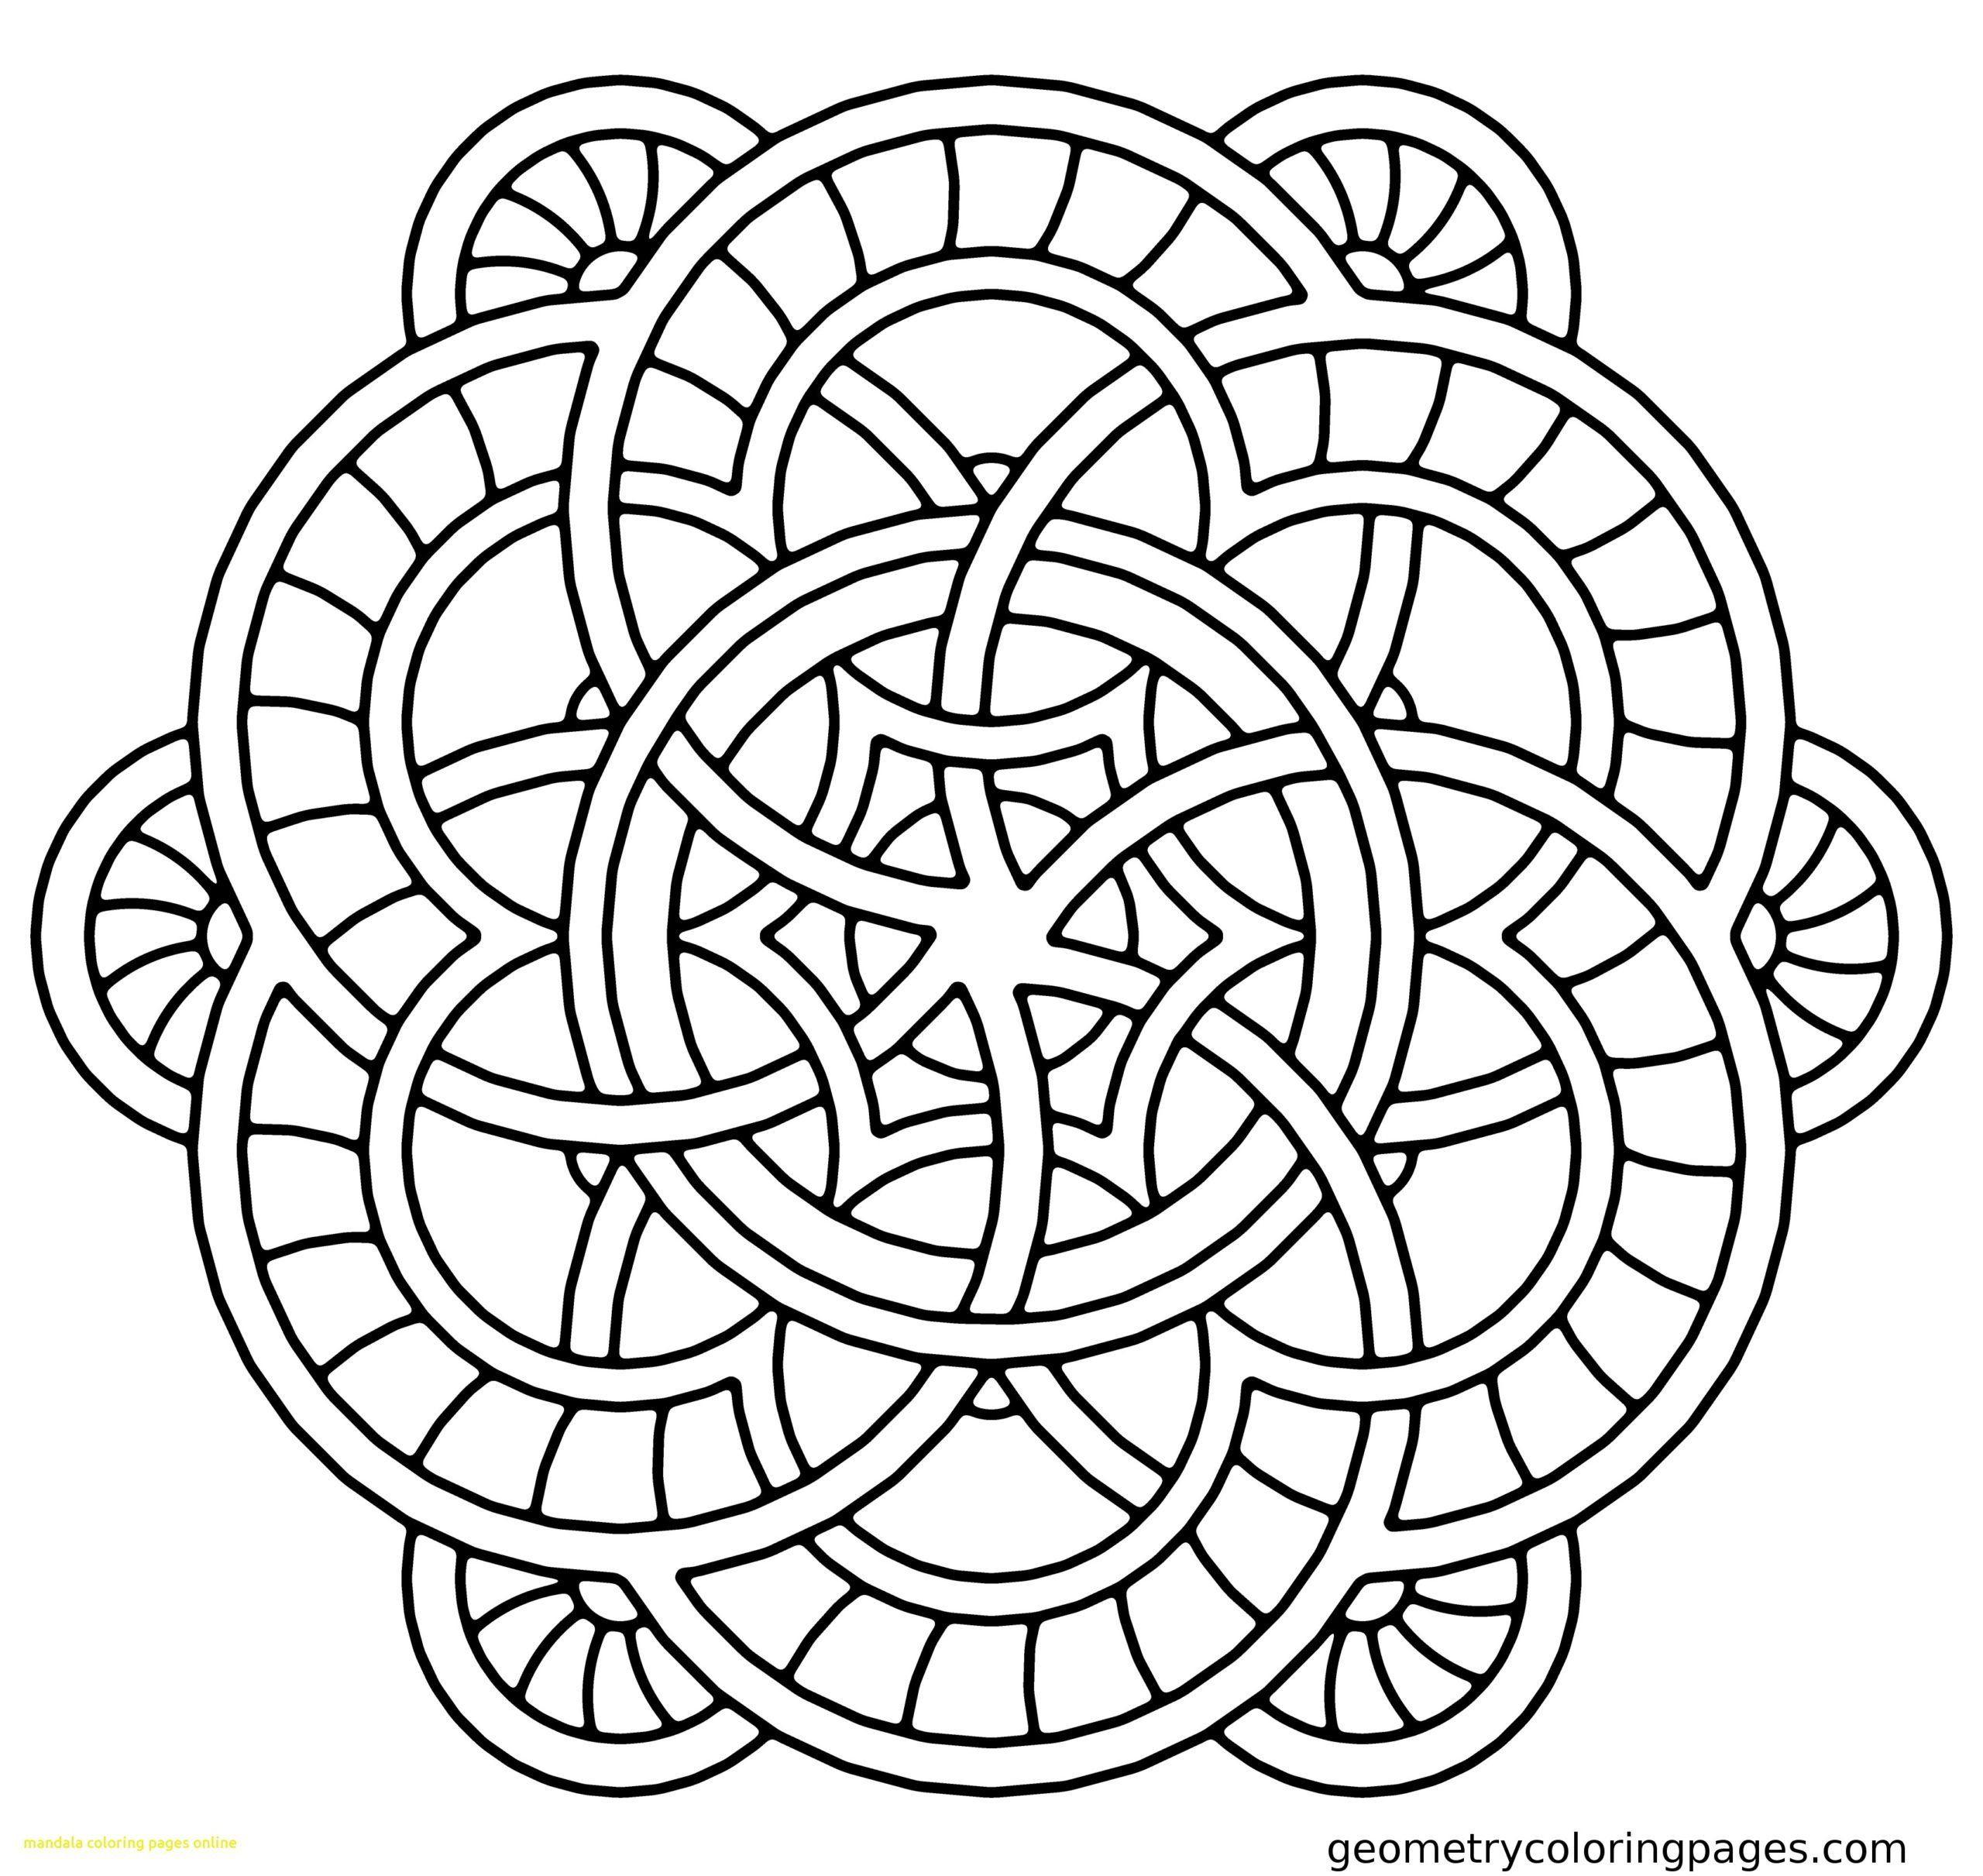 - Pin On Printable Mandala Coloring Pages